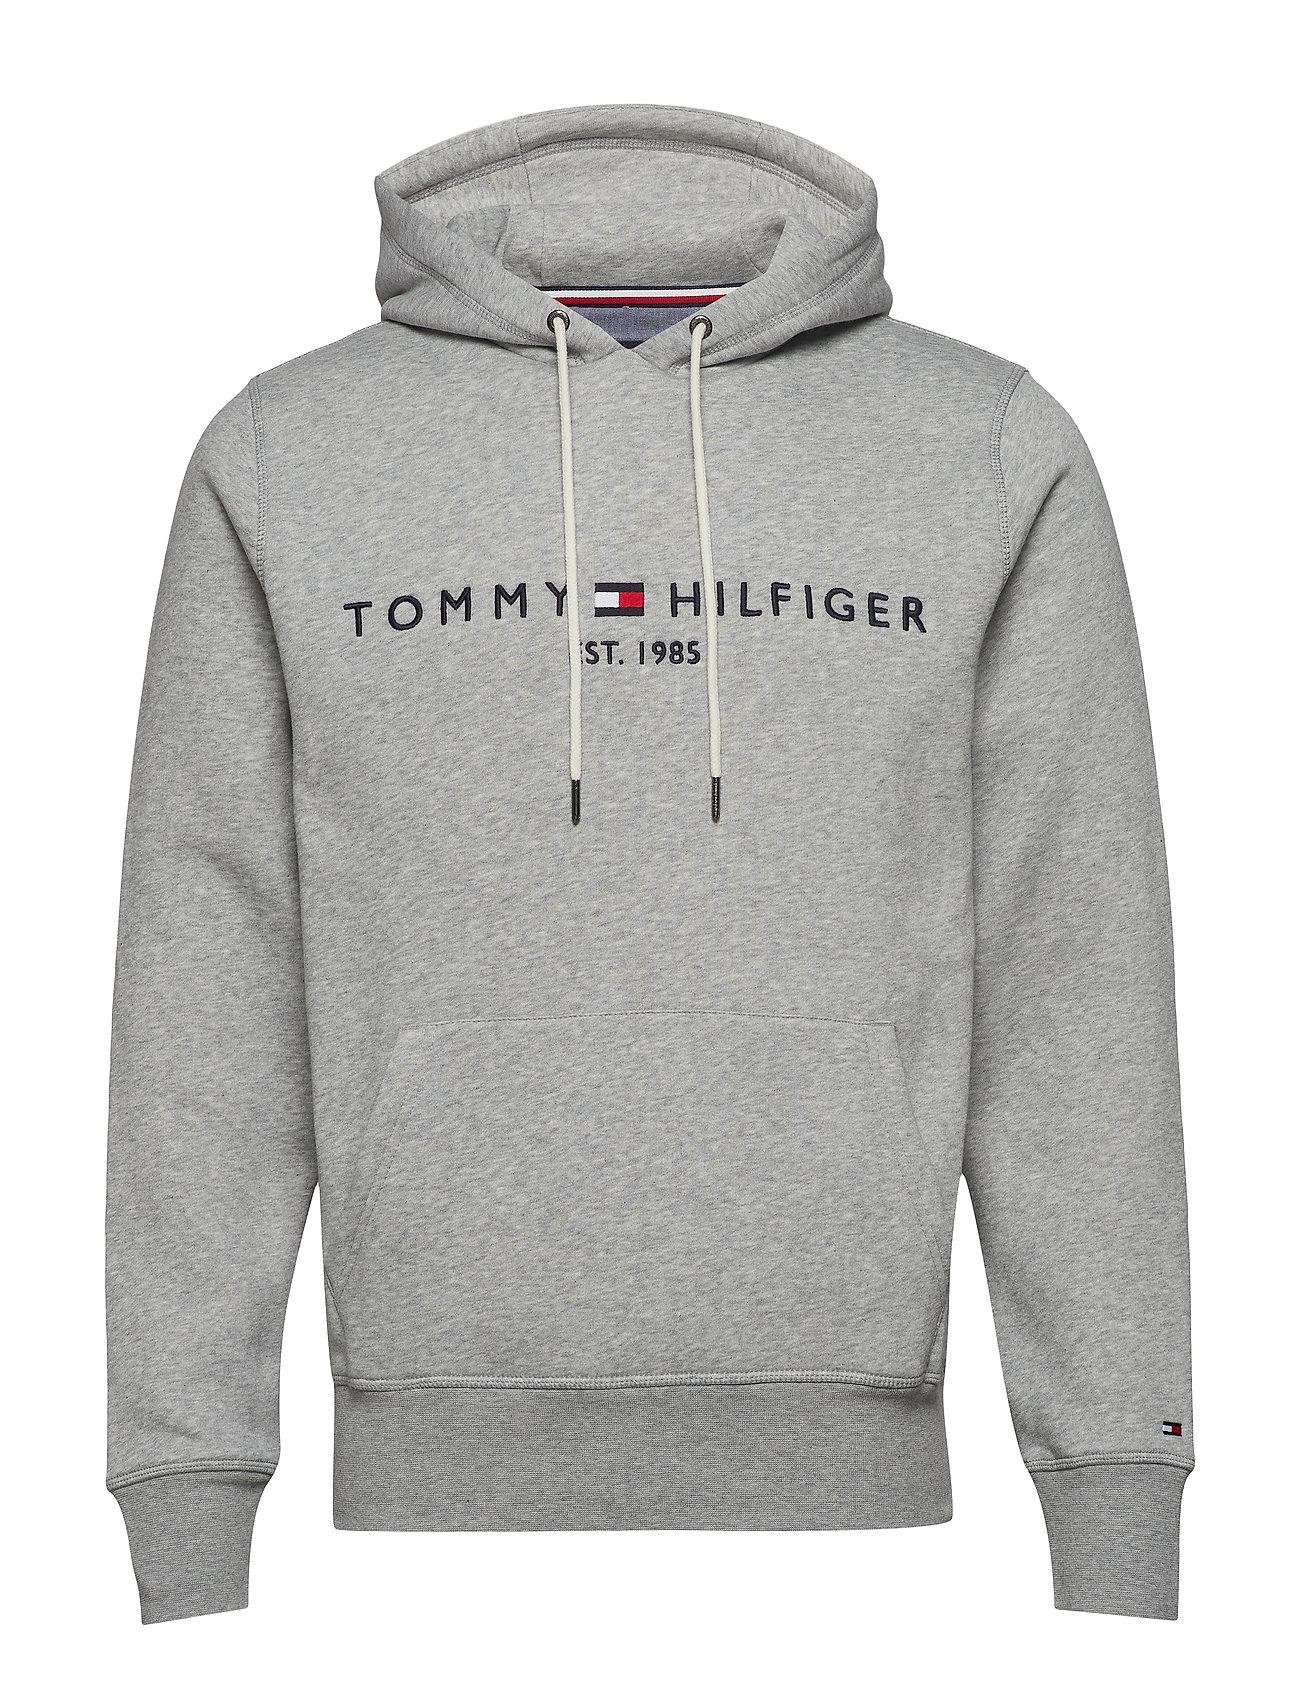 Tommy Hilfiger TOMMY LOGO HOODY - CLOUD HTR